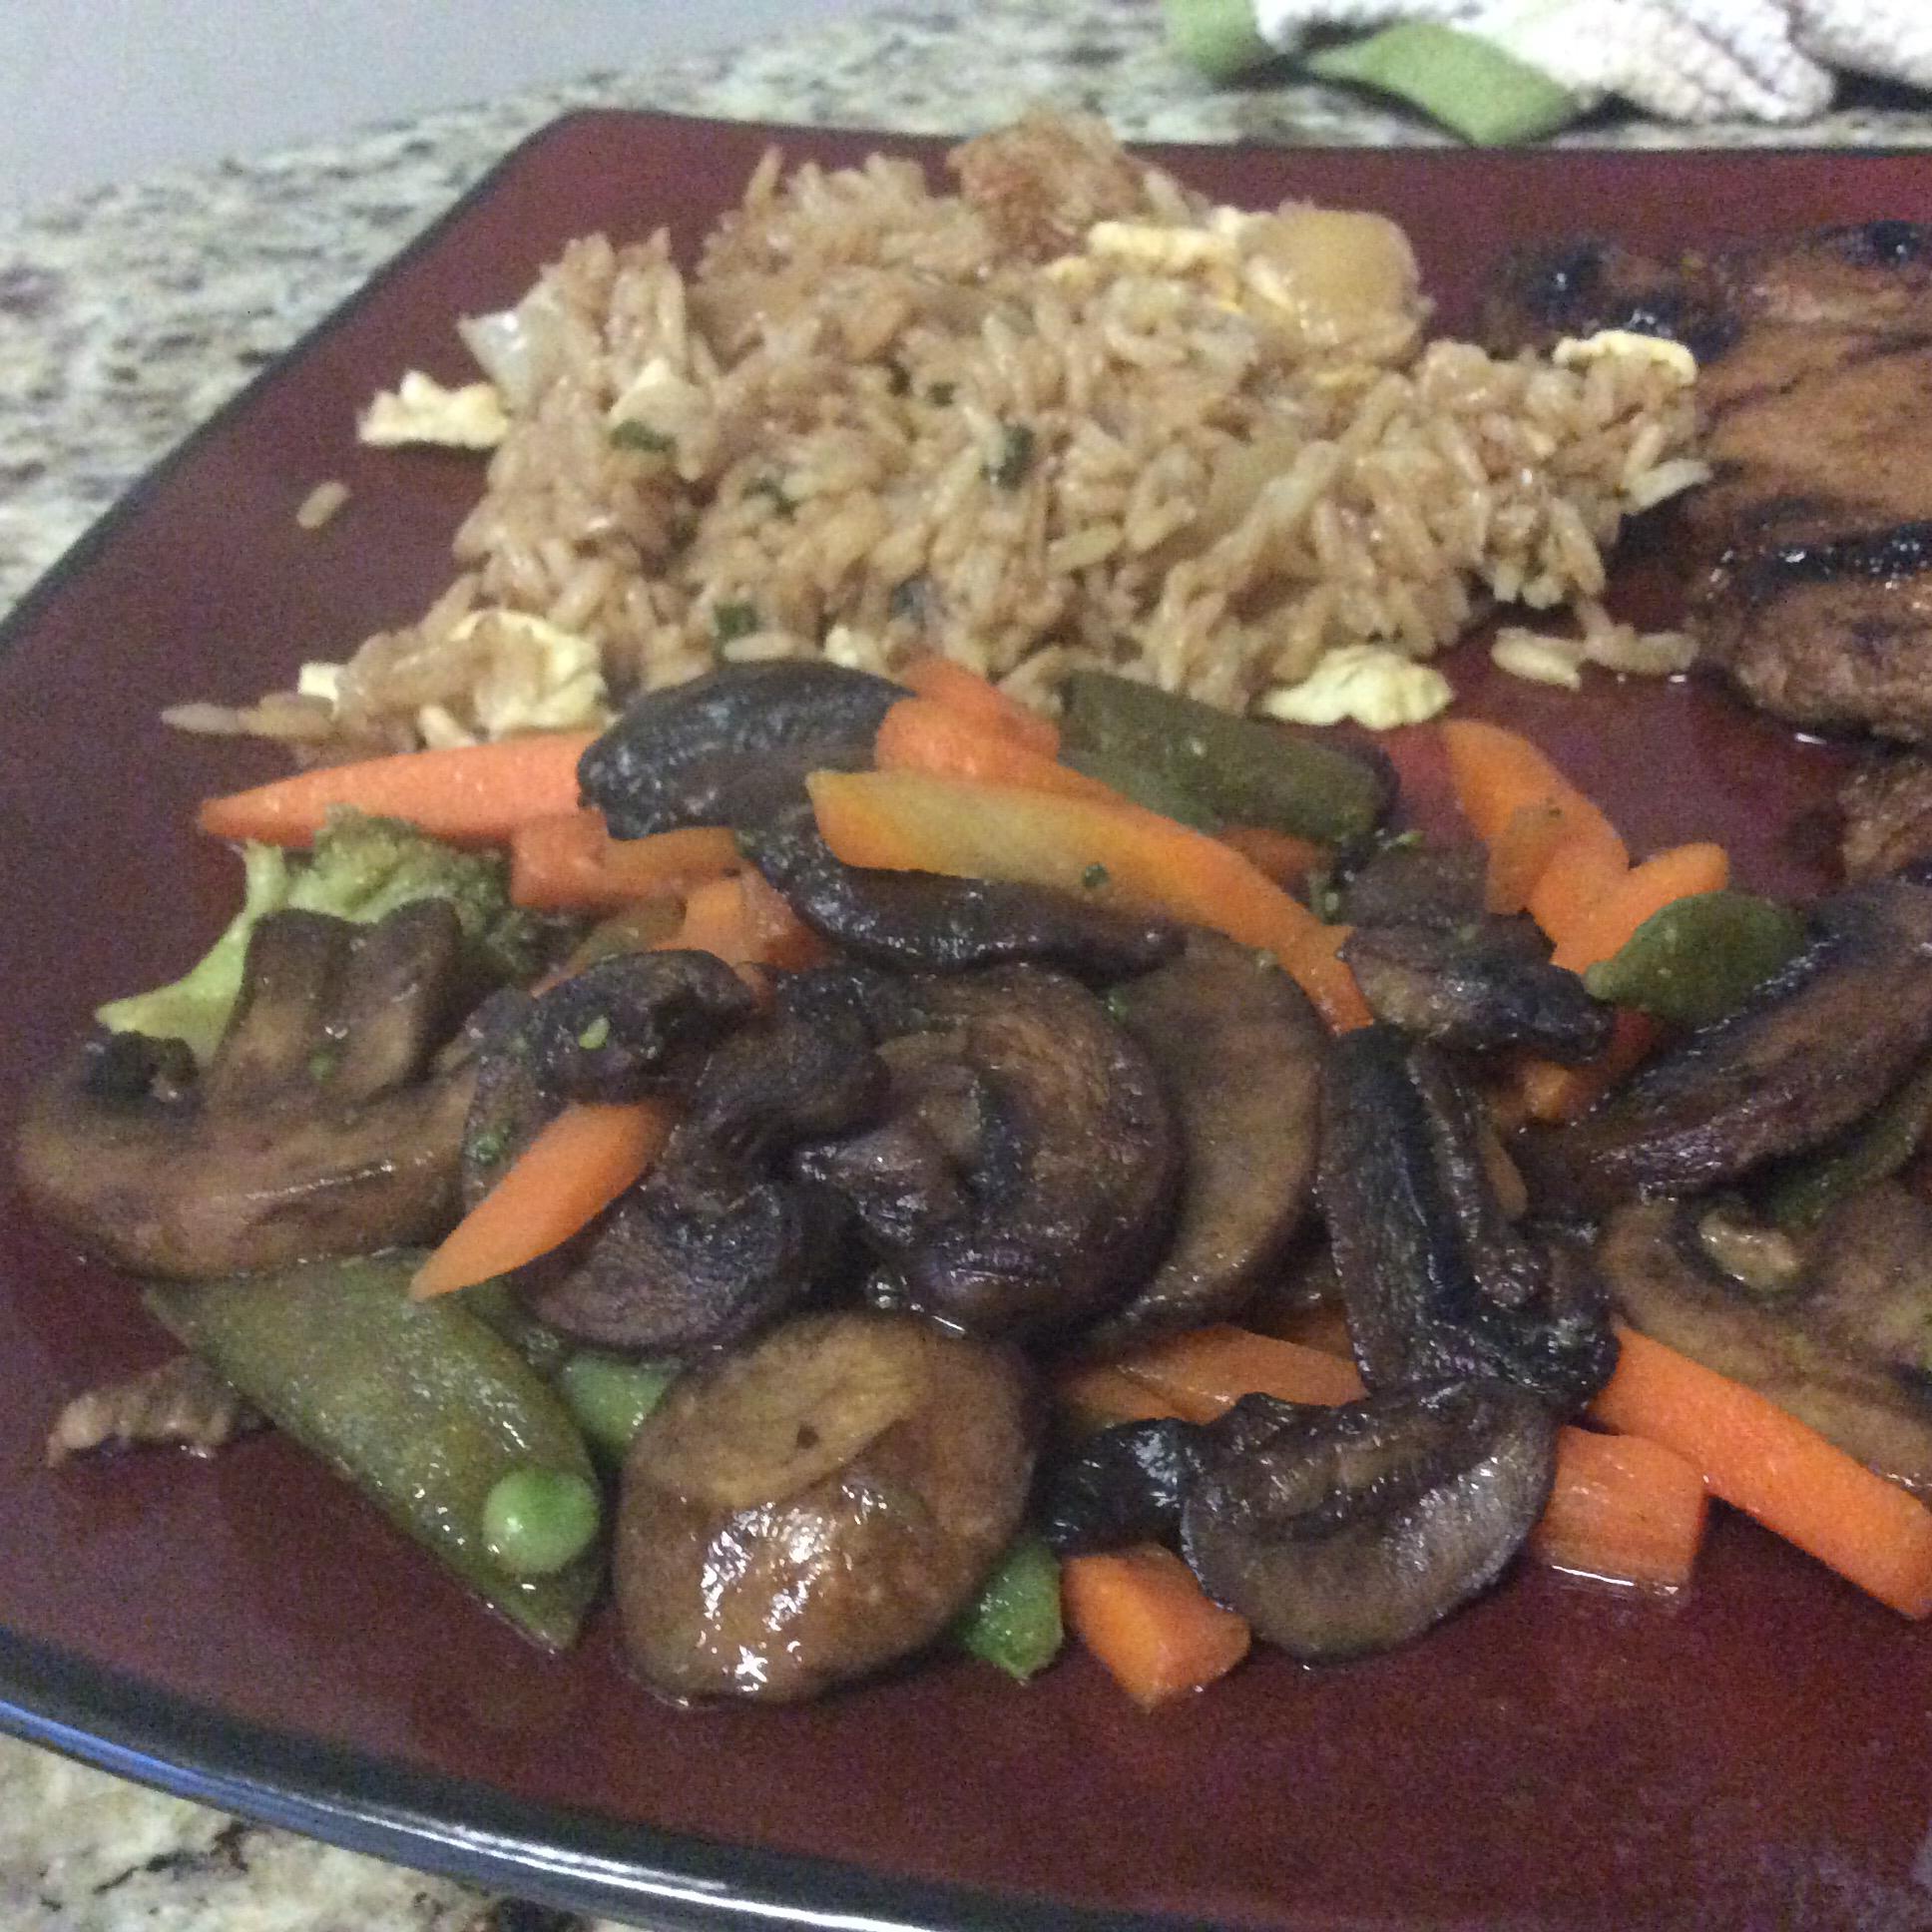 Triple Mushroom and Carrot Medley